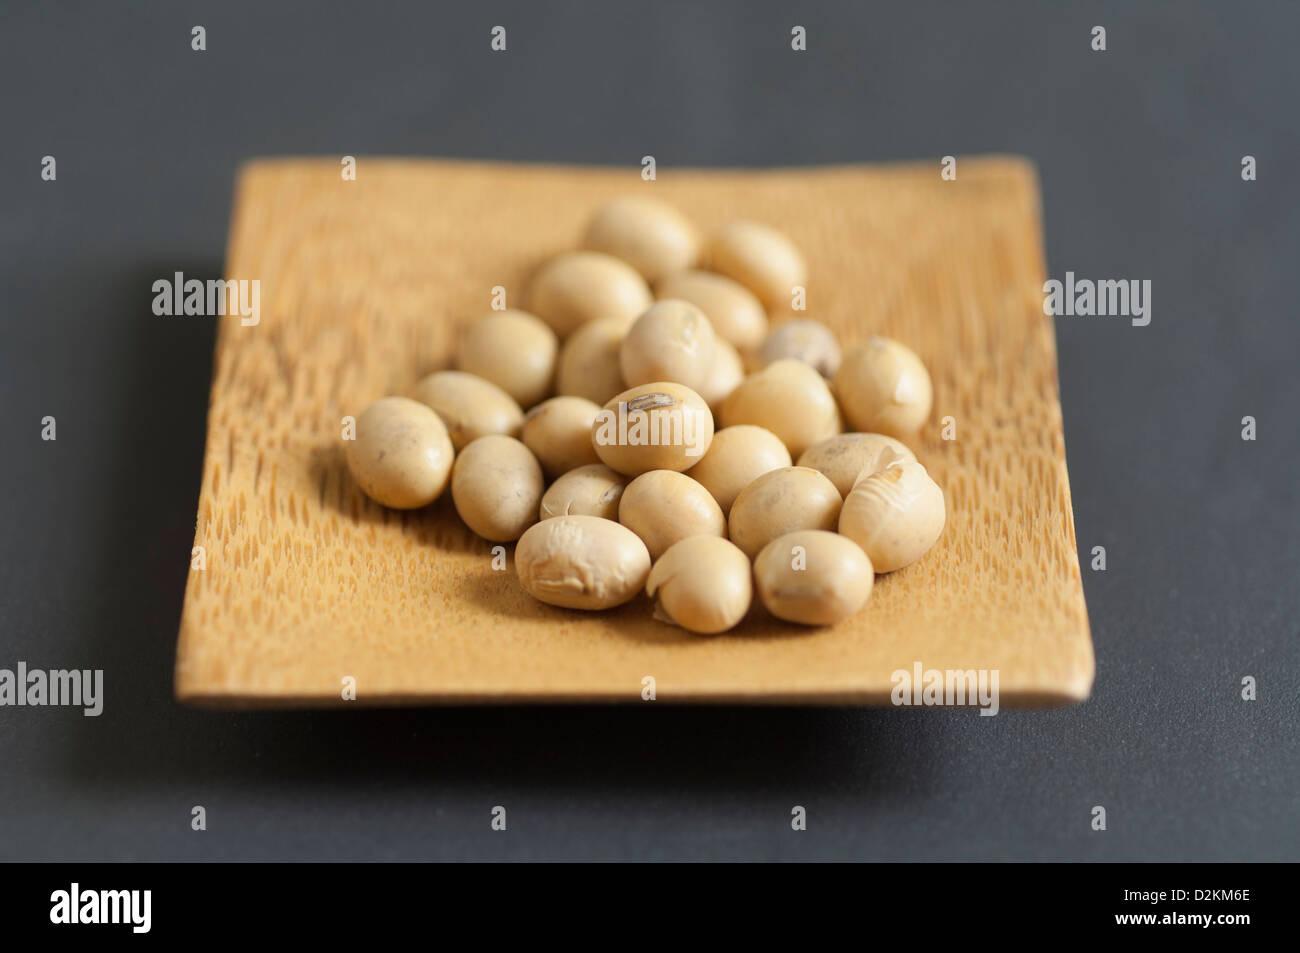 Vue rapprochée de soja bio dans un bol Photo Stock